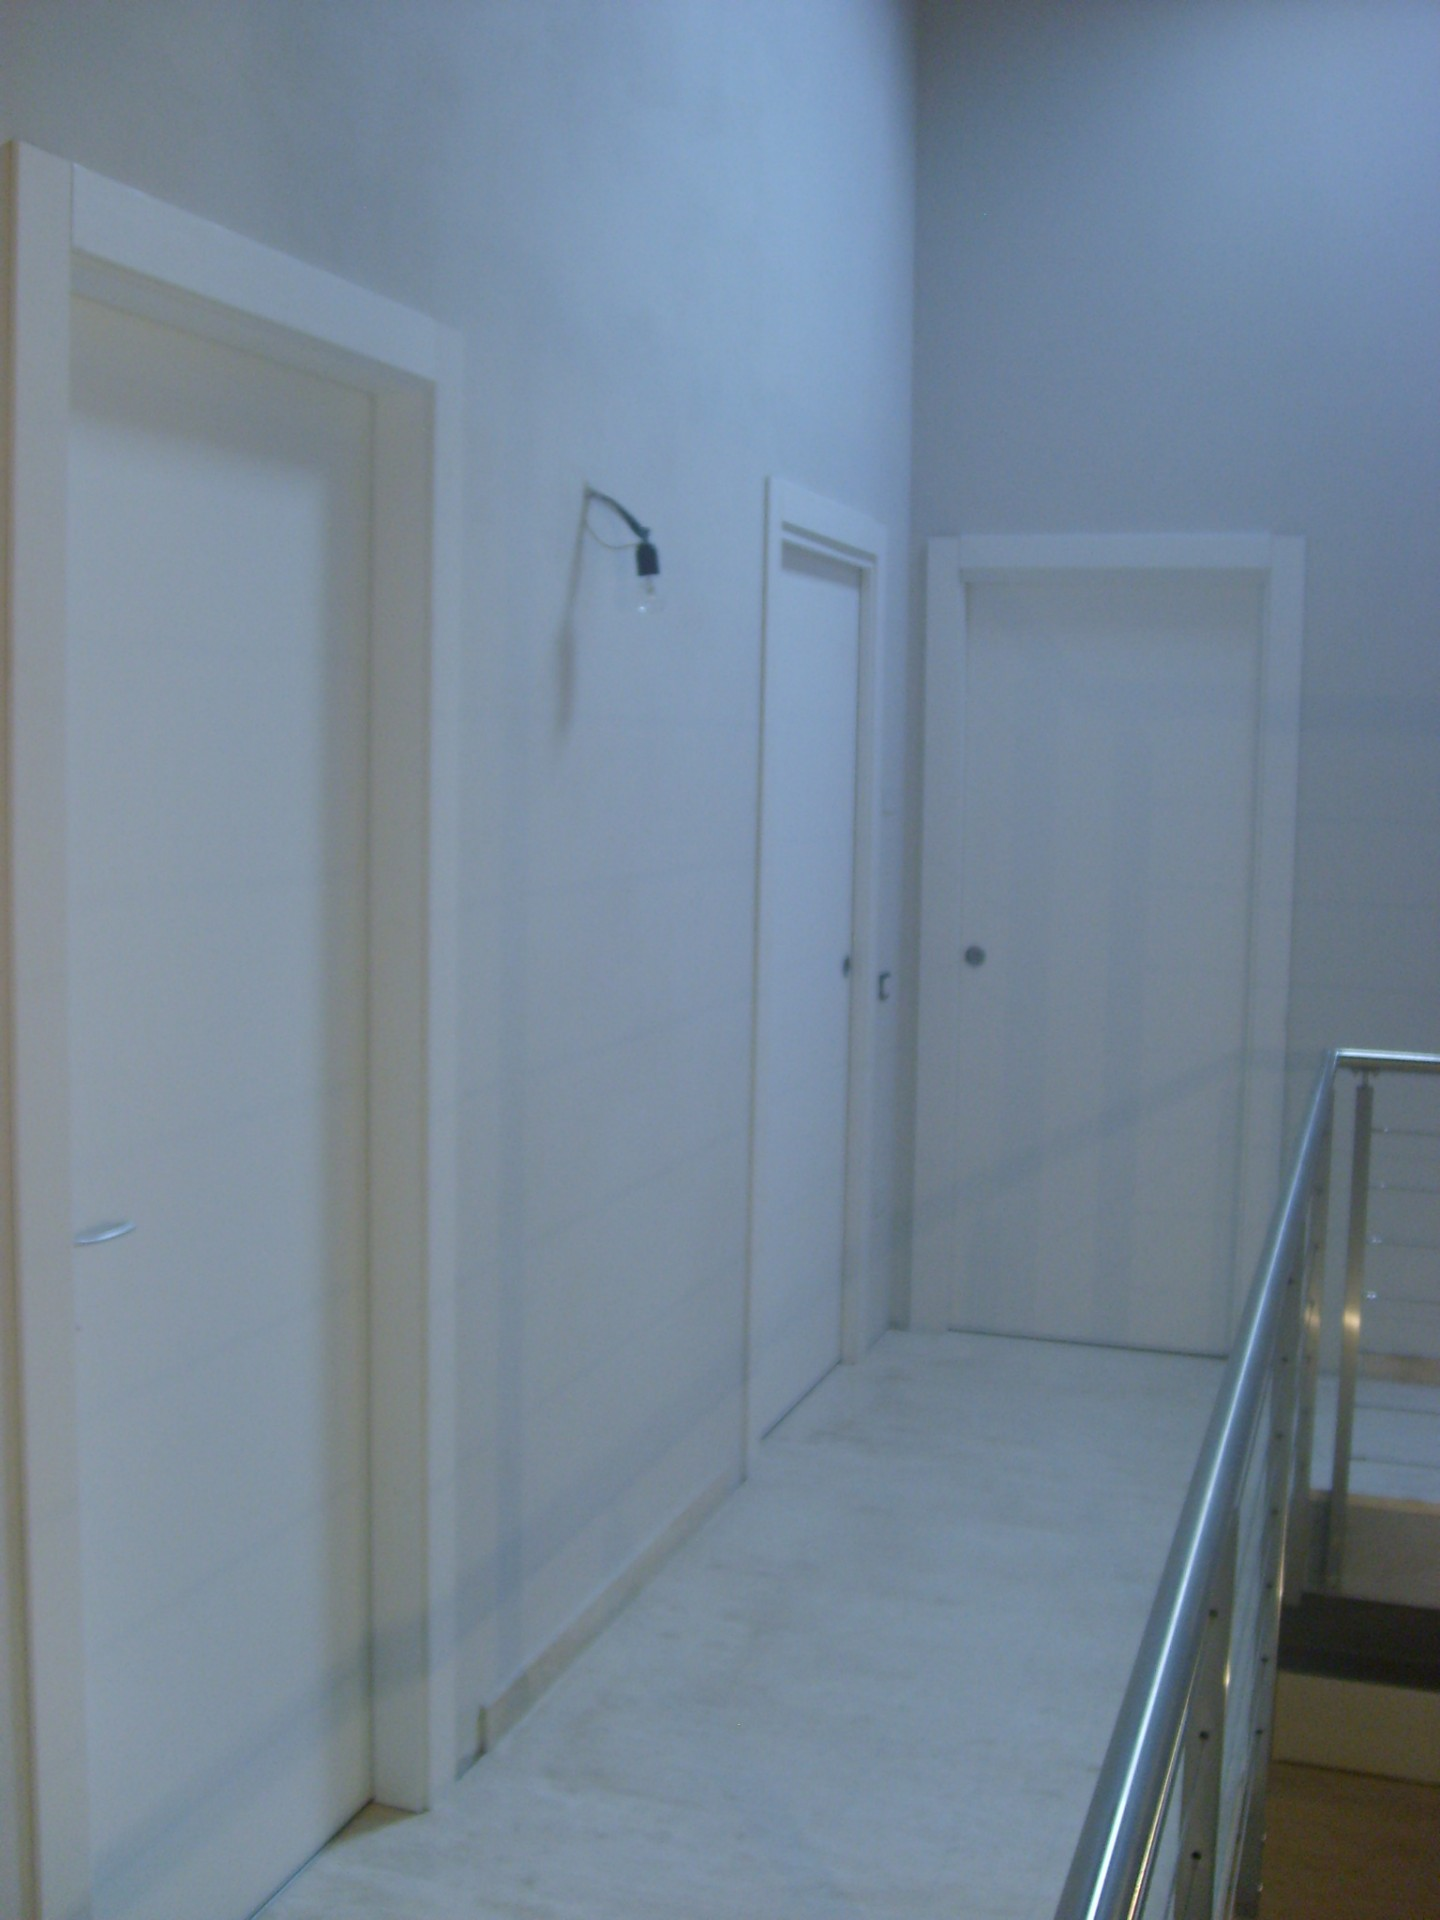 Porte In Larice Bianco.Serramenti In Pvc Porte Interne Porte Blindate Infix